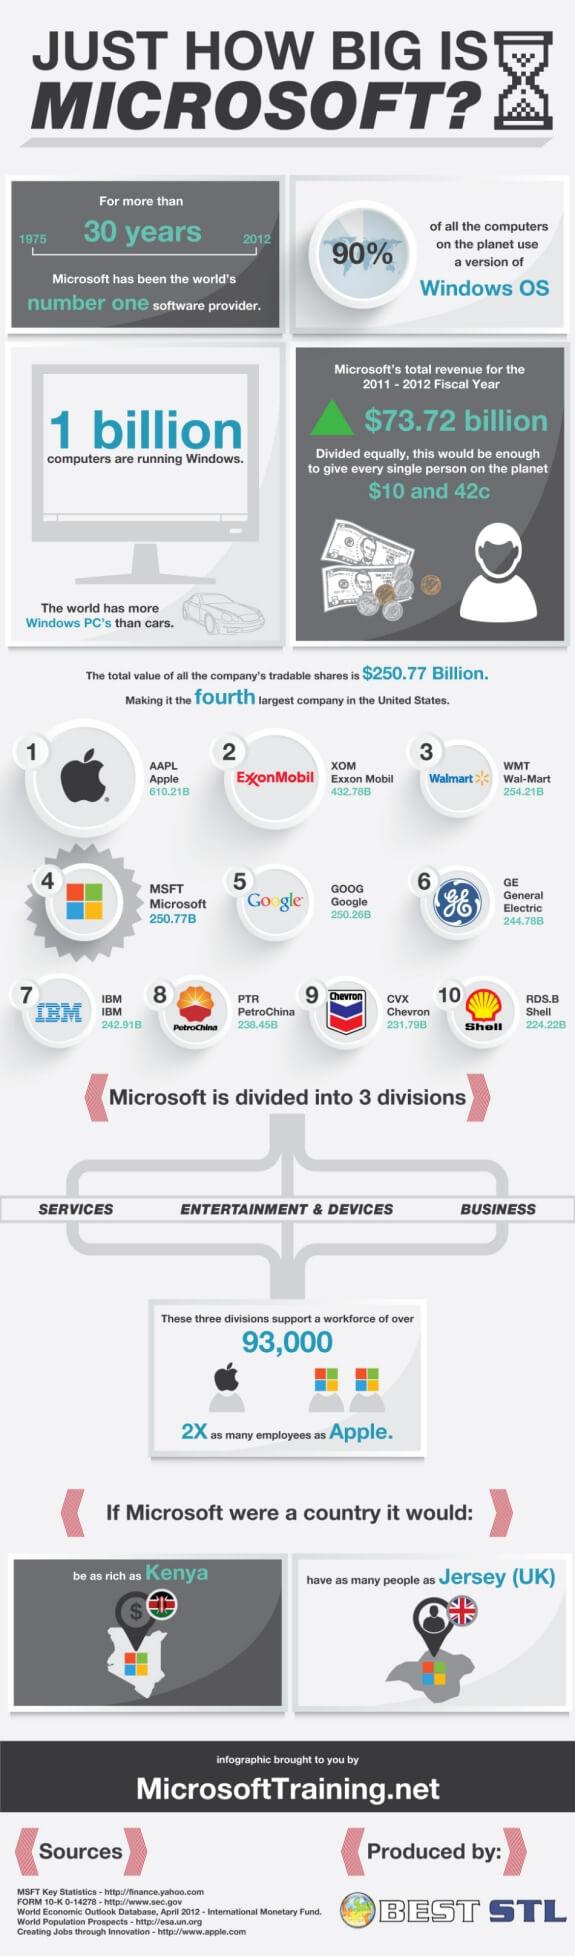 Just How Big Is Microsoft? - Microsoft training partners London